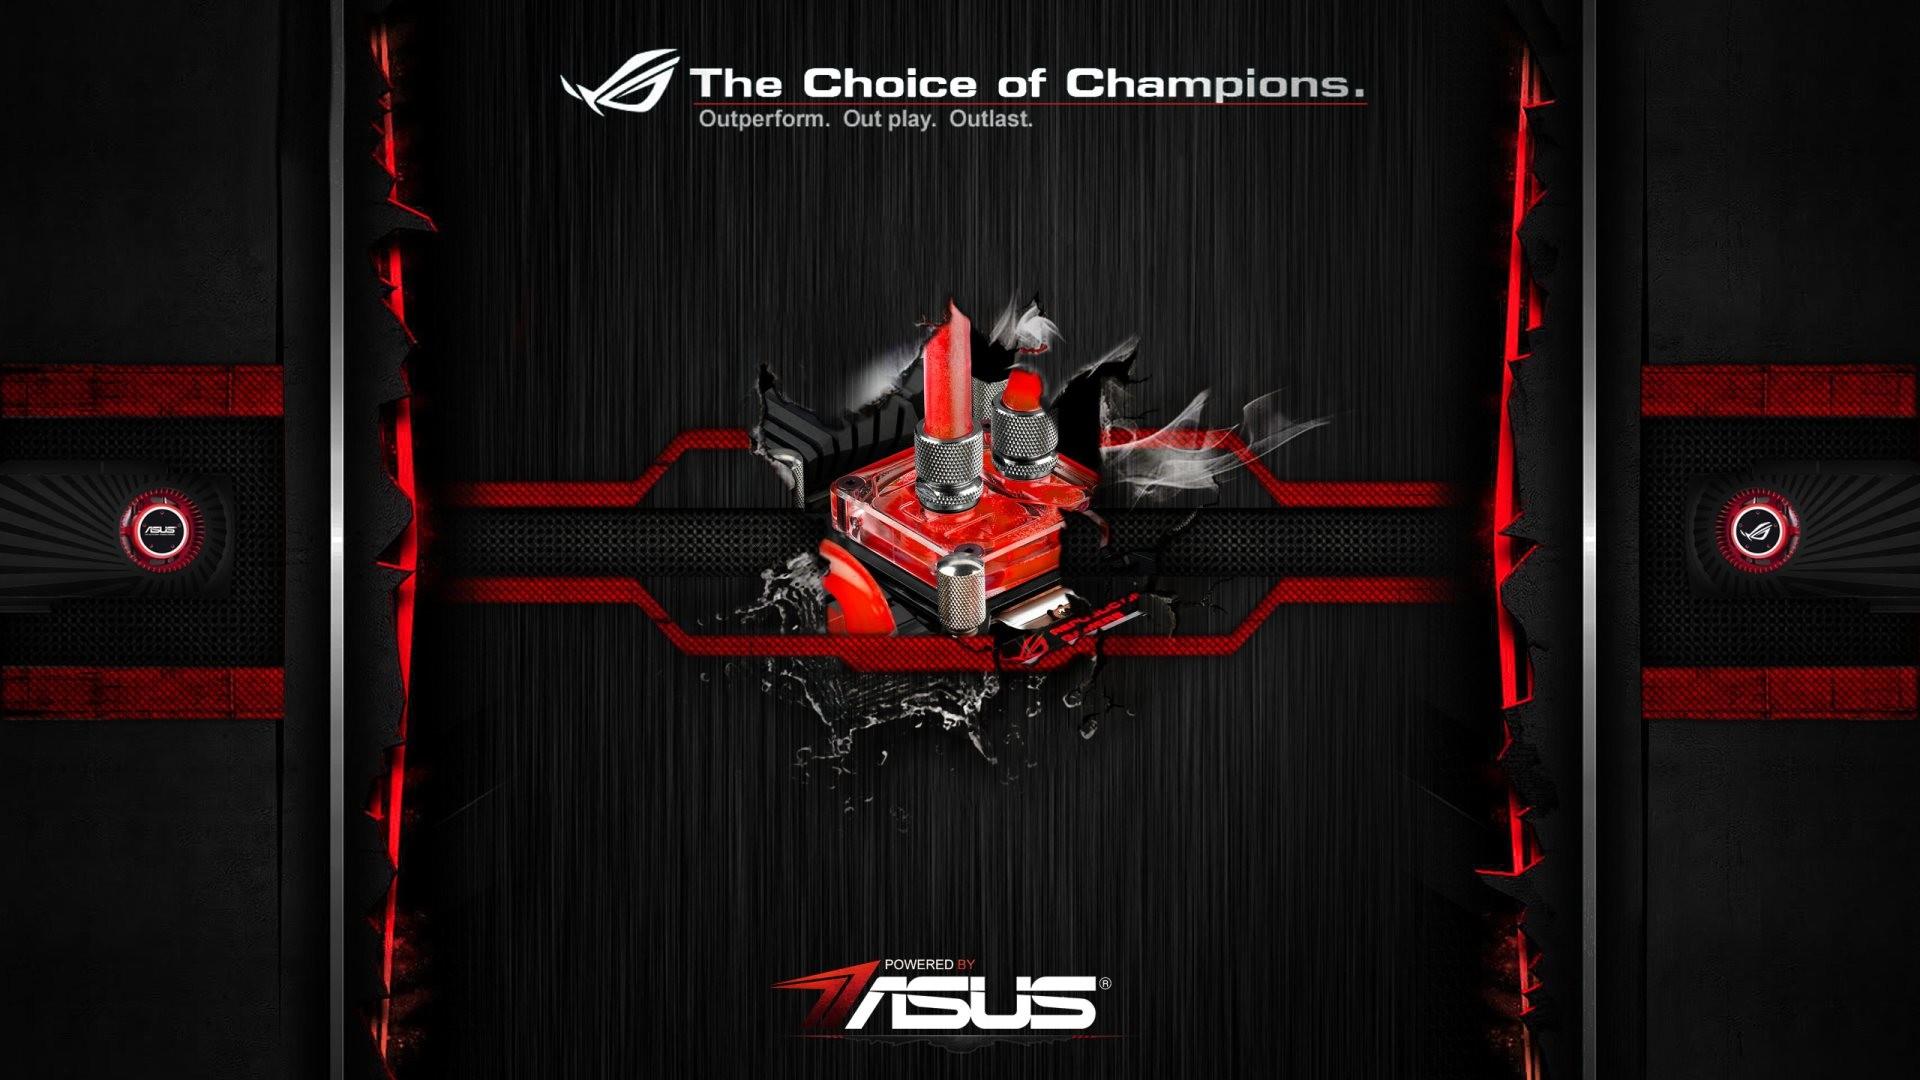 HD Wallpaper: Asus ROG Power Up